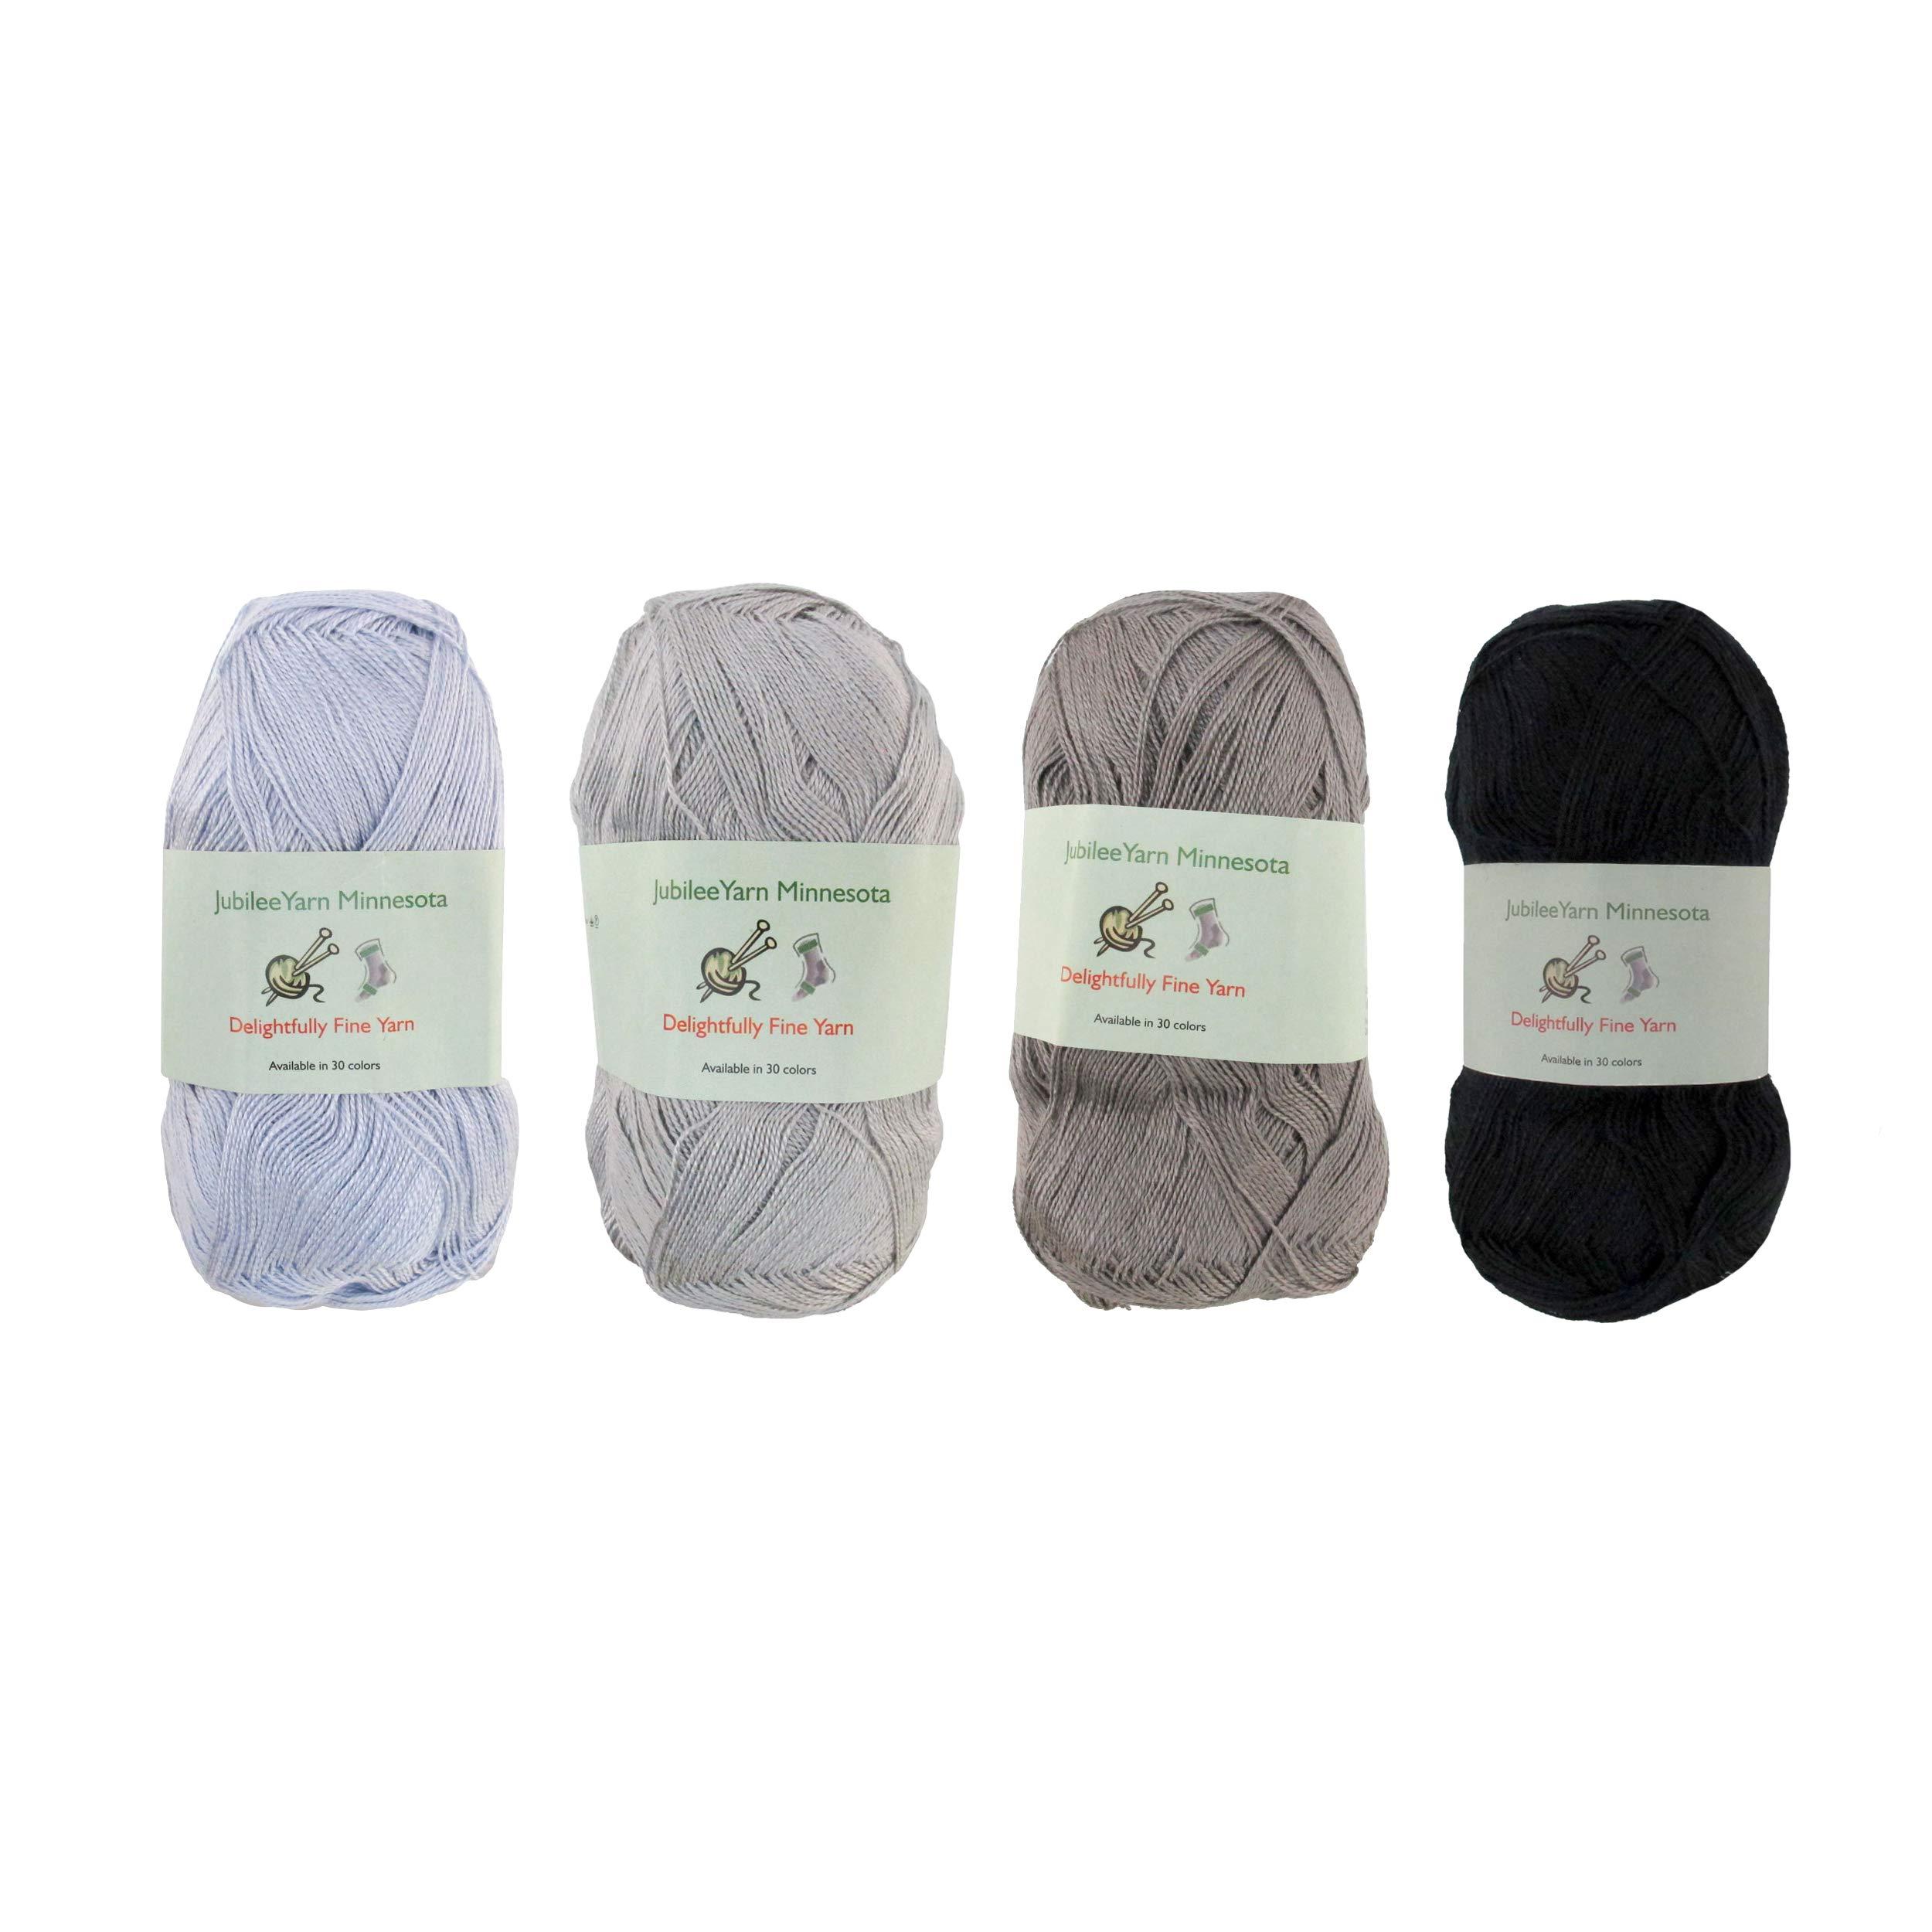 Lace Weight Tencel Yarn - Delightfully Fine - 60% Bamboo 40% Tencel Yarn - 4 Skeins - Shades of Grey Assortment